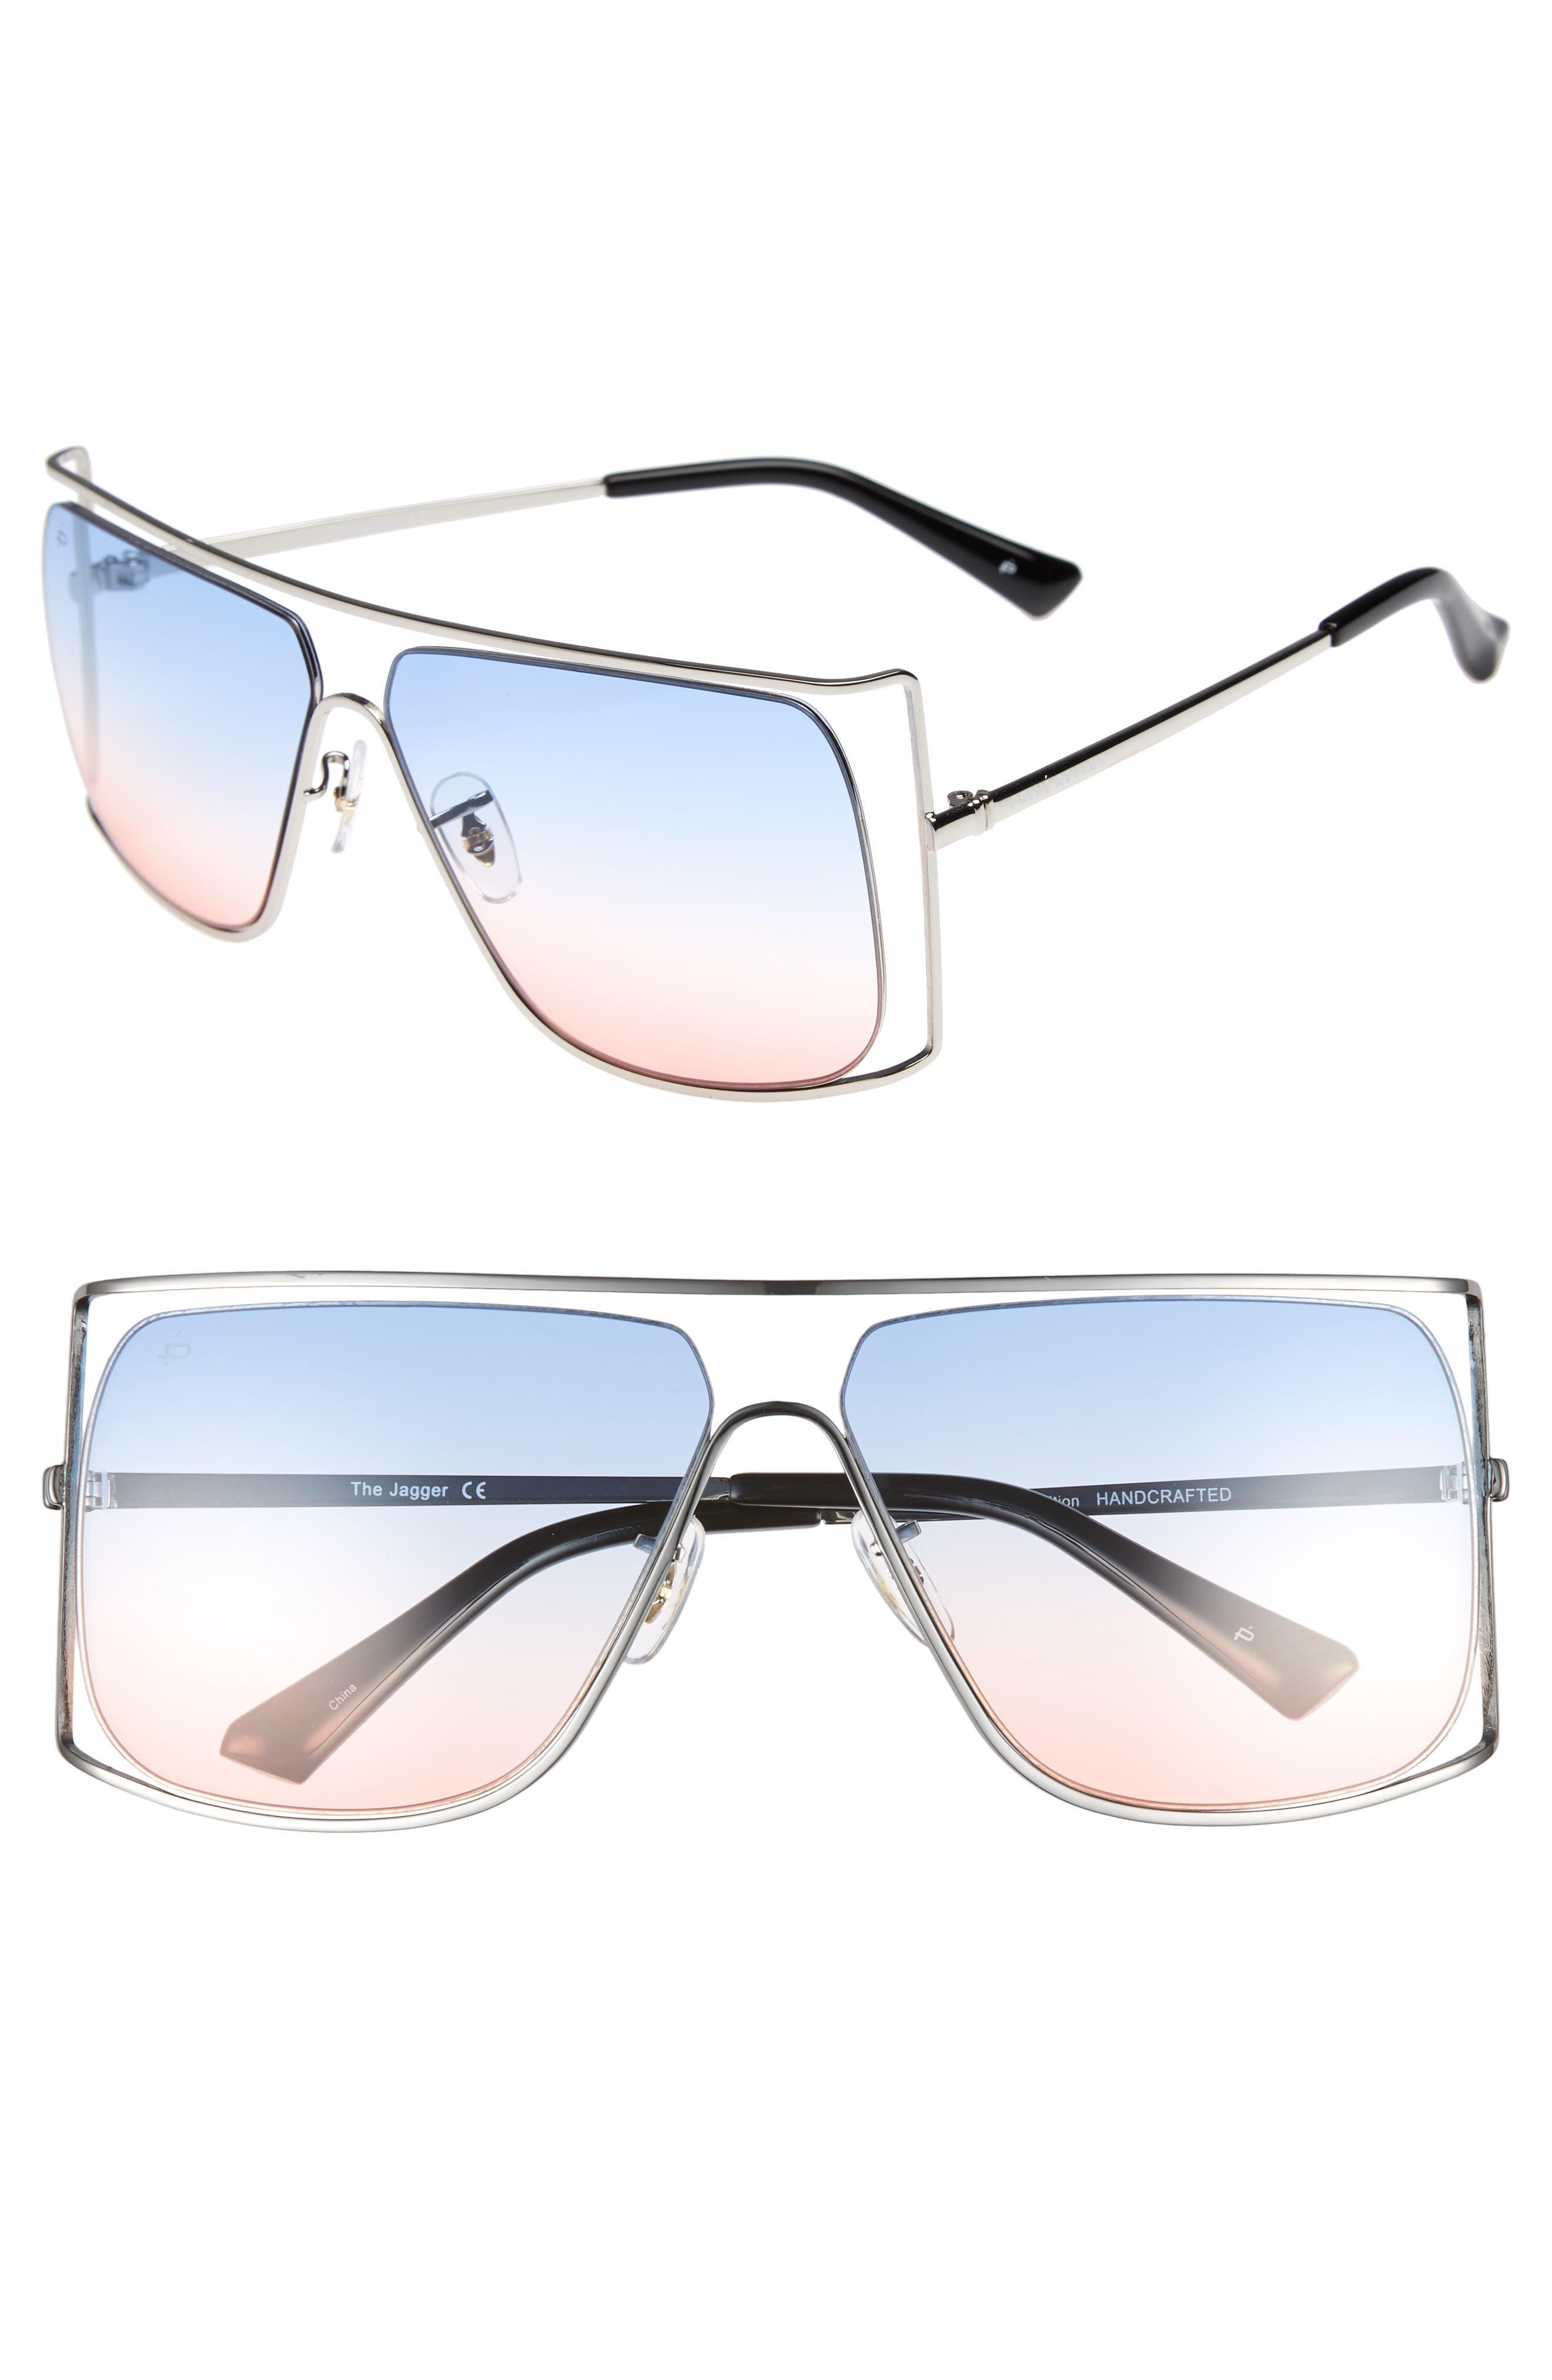 Privé Revaux The Jagger 60mm Square Sunglasses